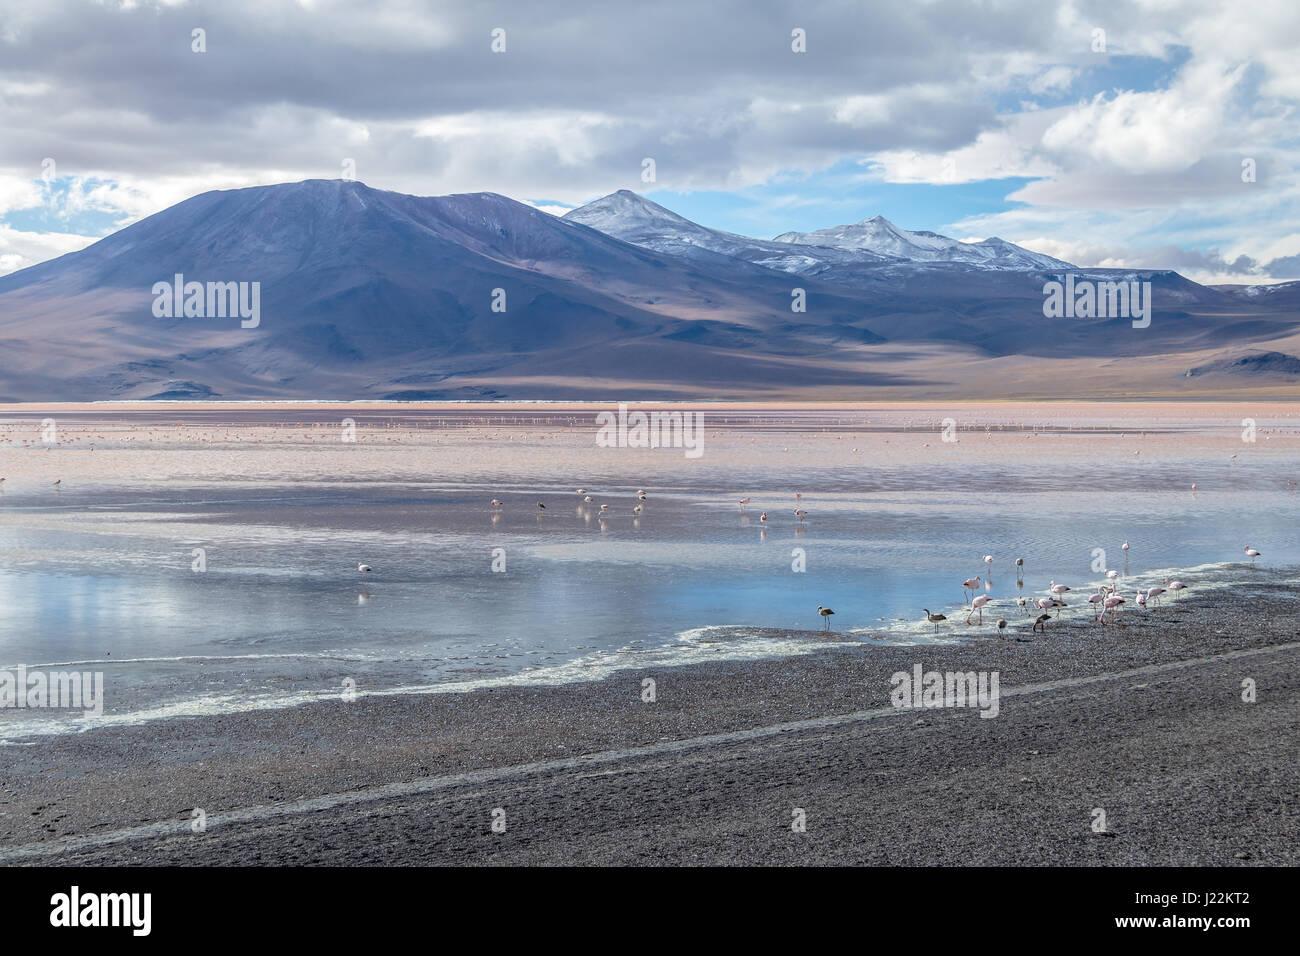 Laguna Colorada (Red Lagoon) in Bolivean altiplano - Potosi Department, Bolivia - Stock Image